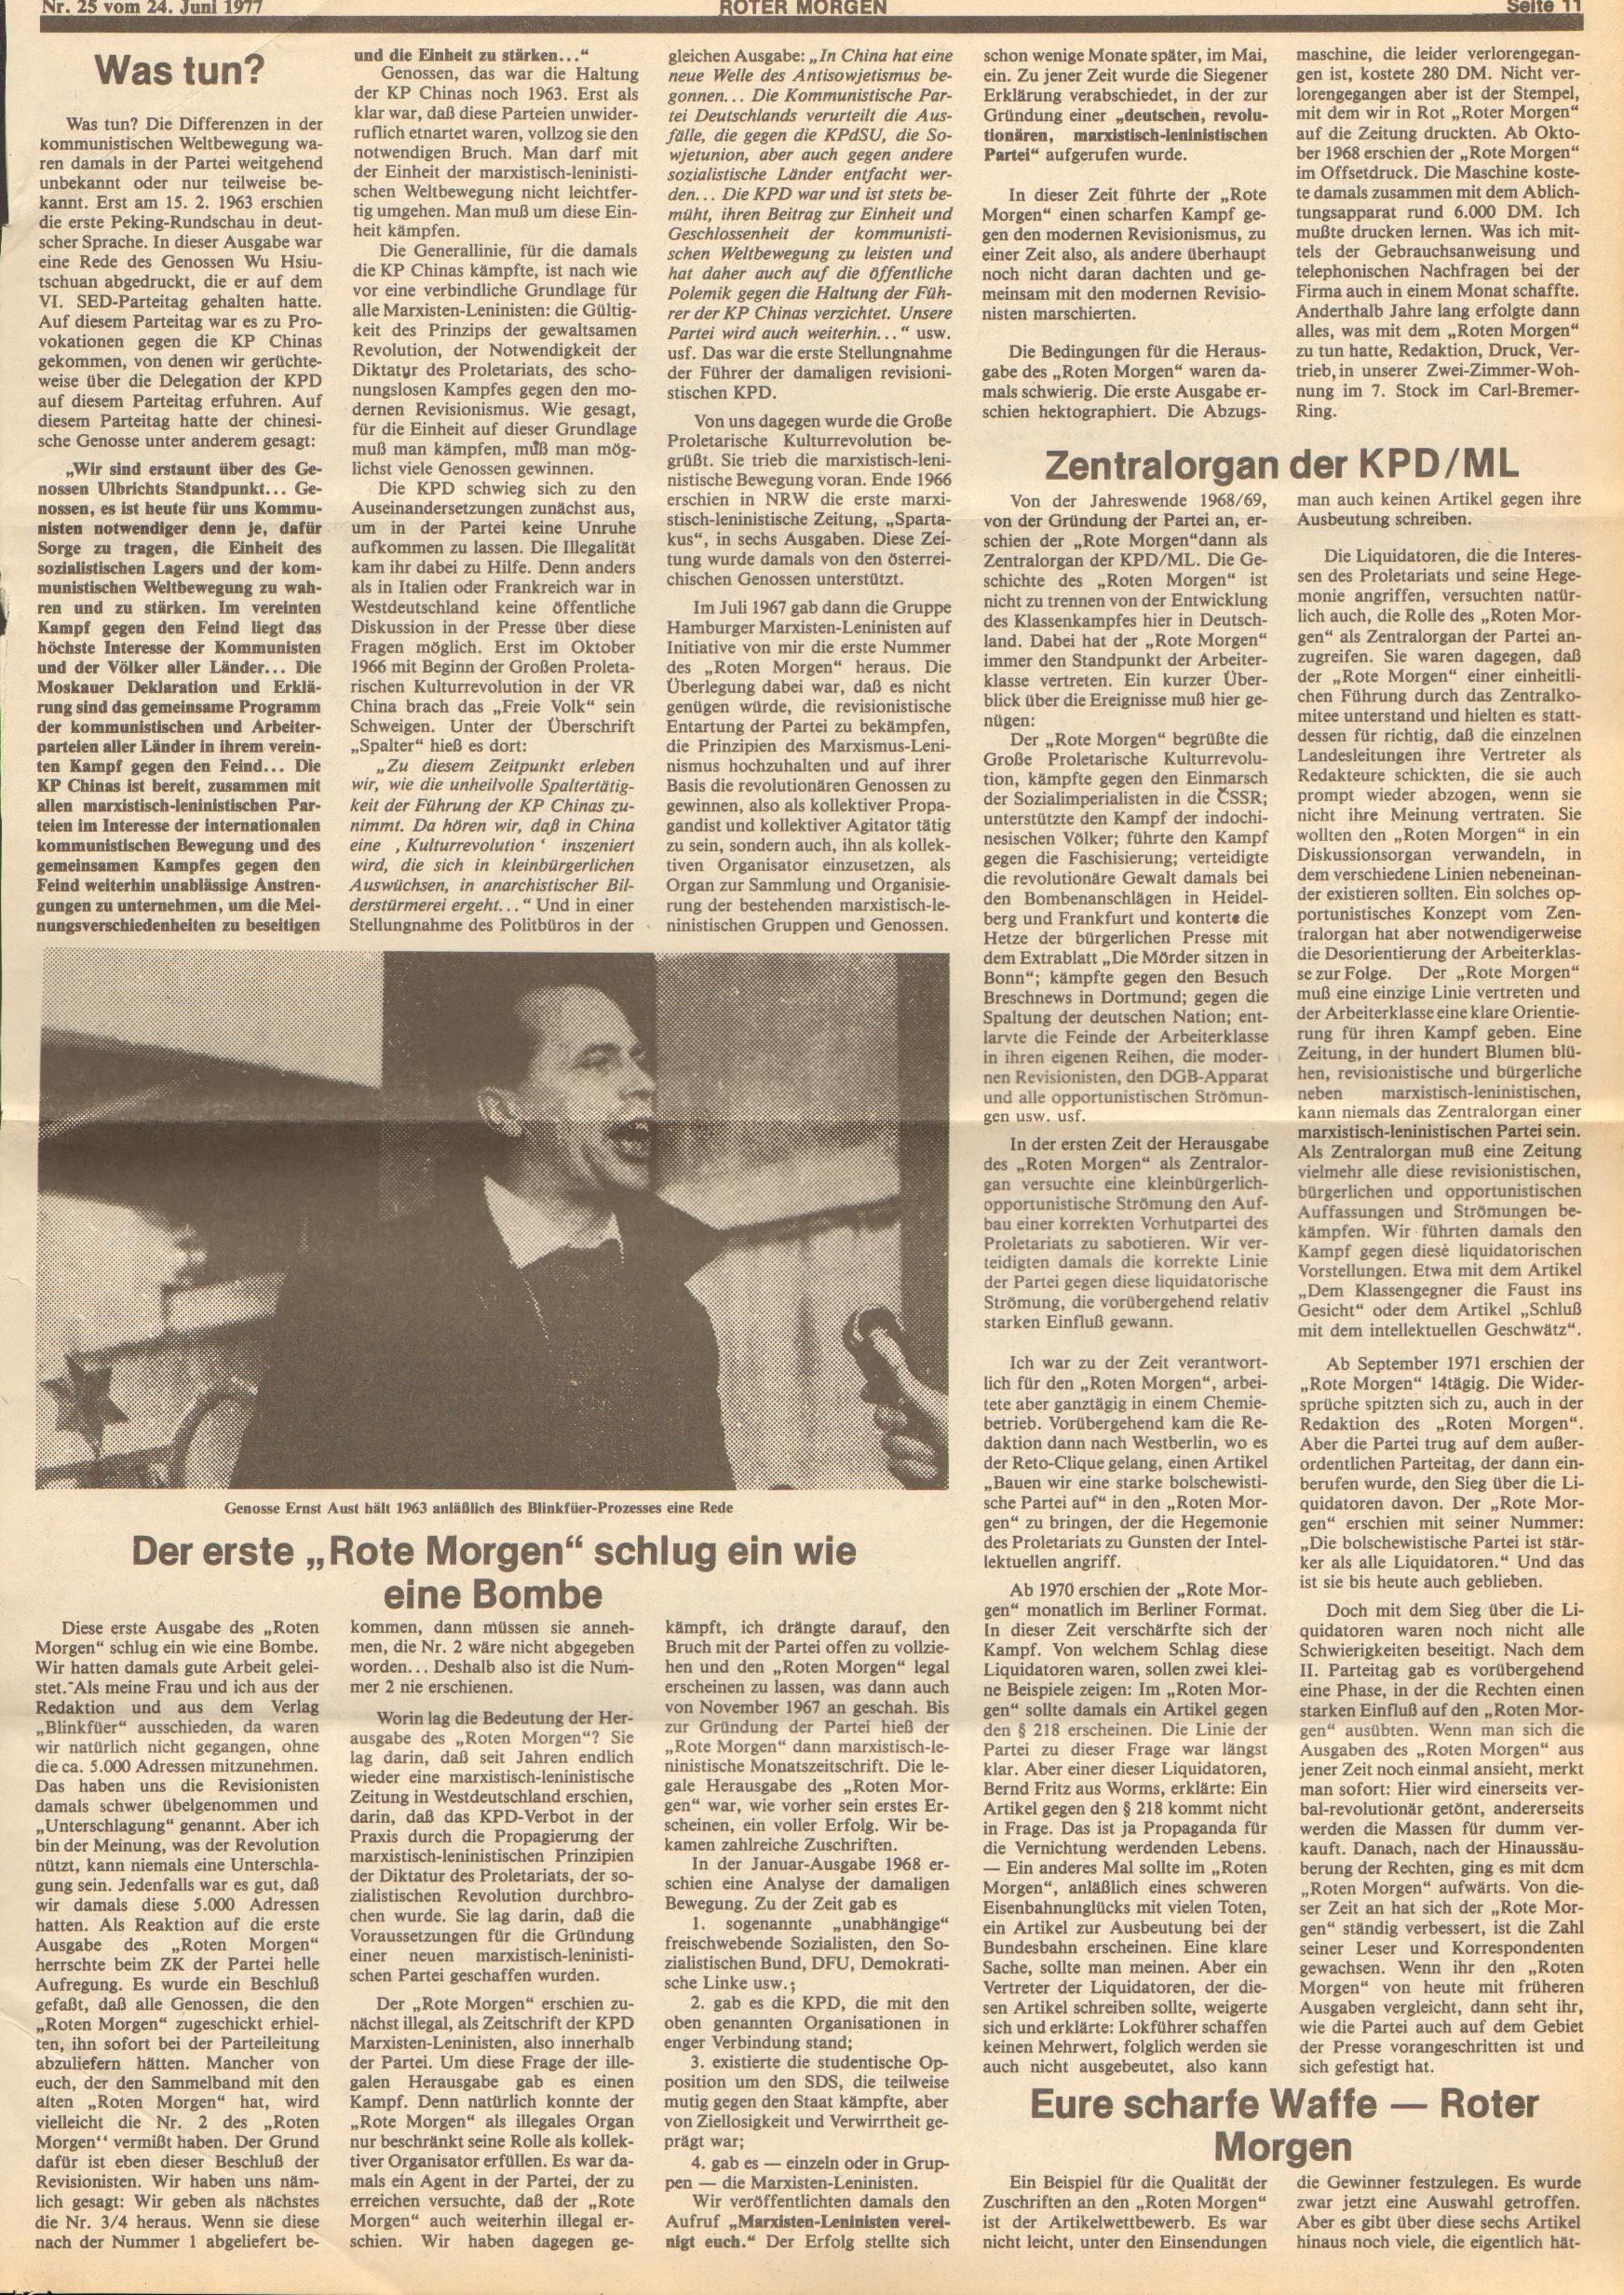 Roter Morgen, 11. Jg., 24. Juni 1977, Nr. 25, Seite 11